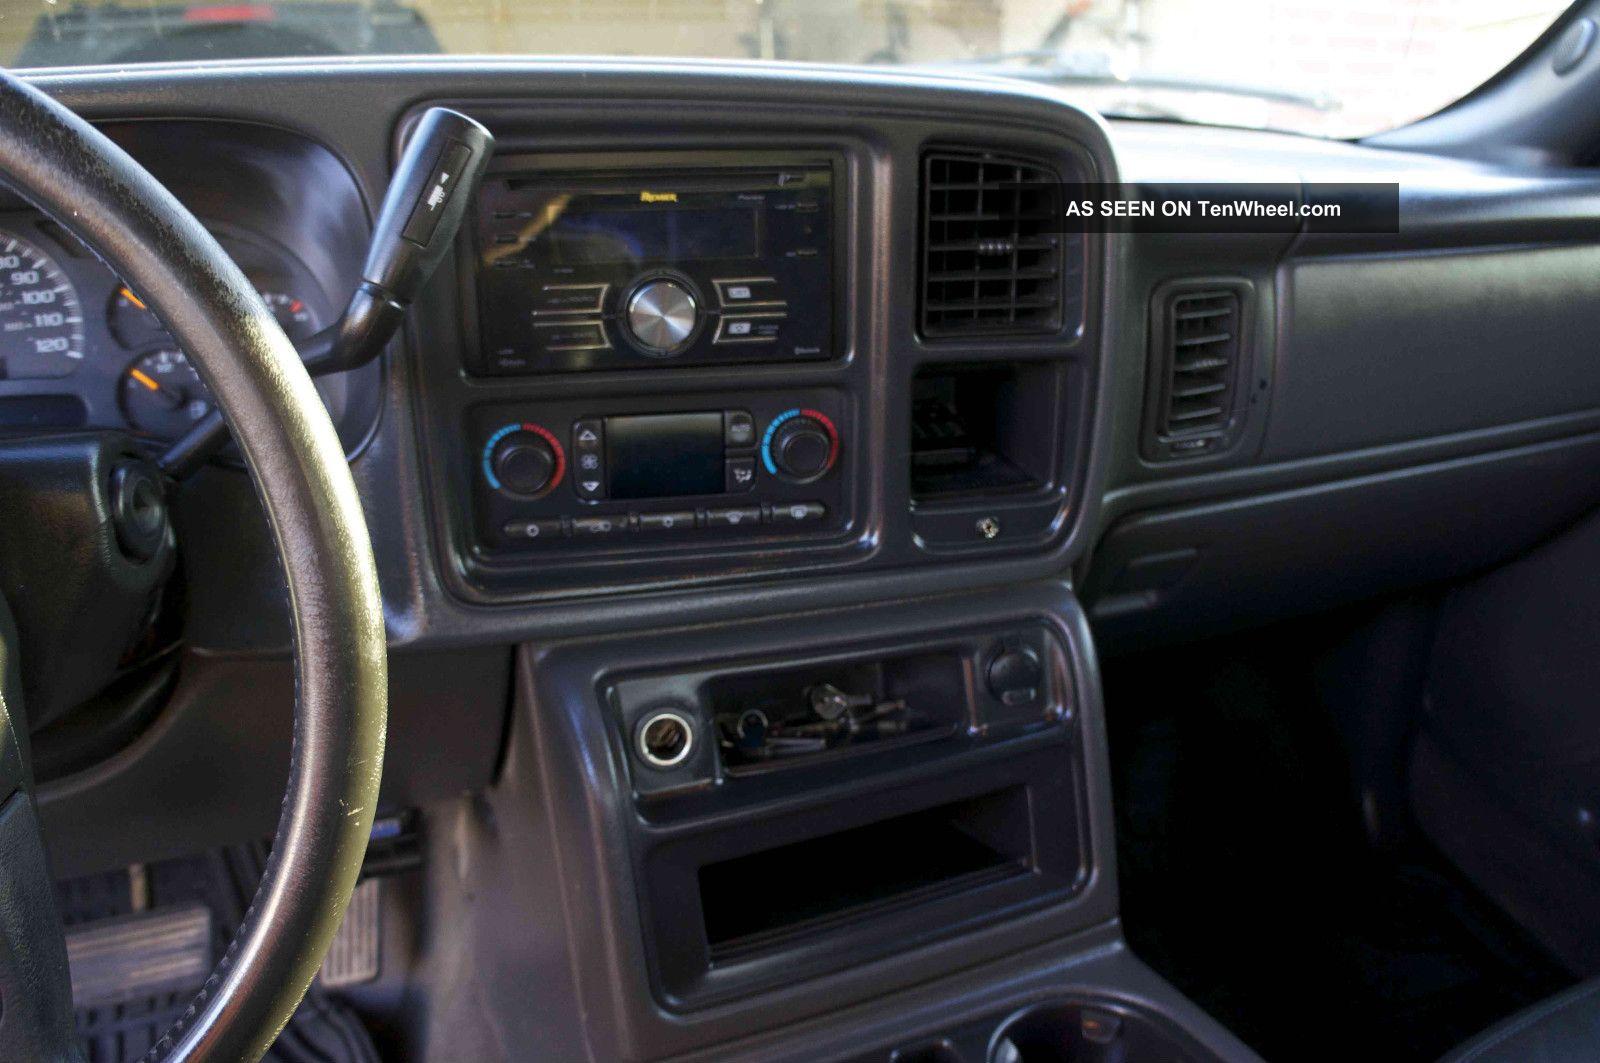 Chevrolet Silverado Z Extended Cab Pickup Door L Lgw on 2006 Dodge Dakota Extended Cab